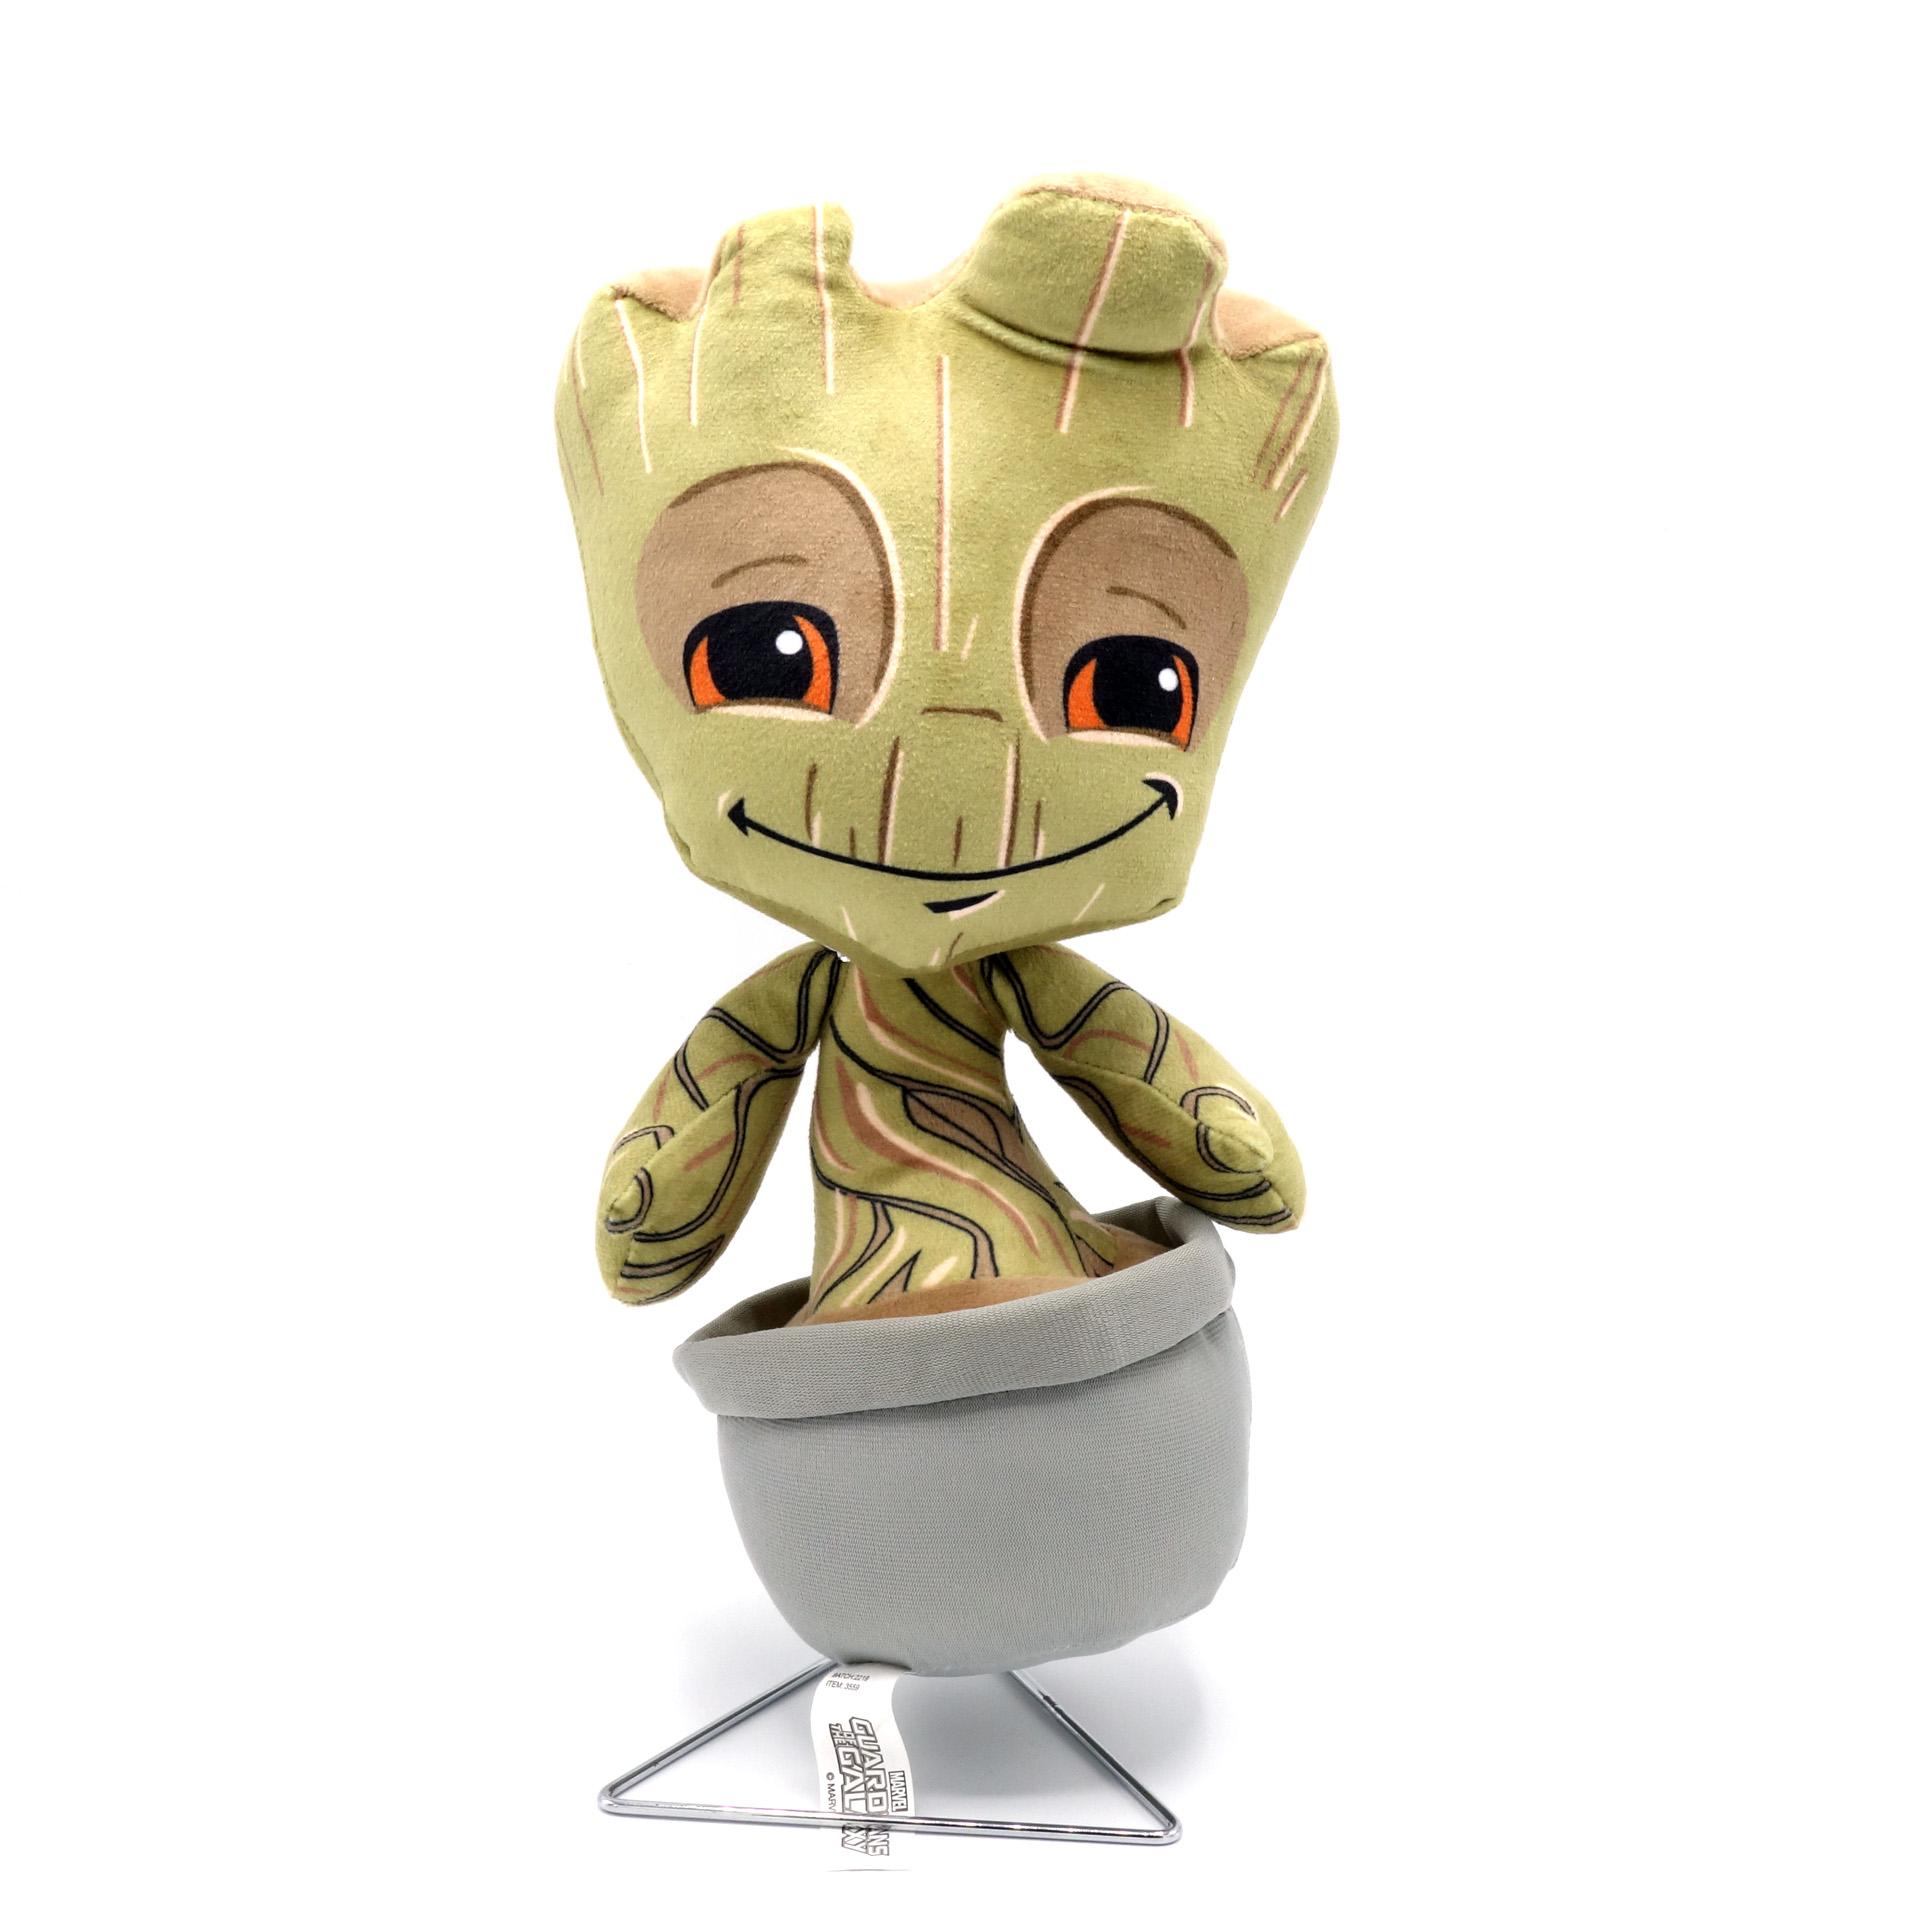 Guardians of the Galaxy Groot Plüsch Kuscheltier